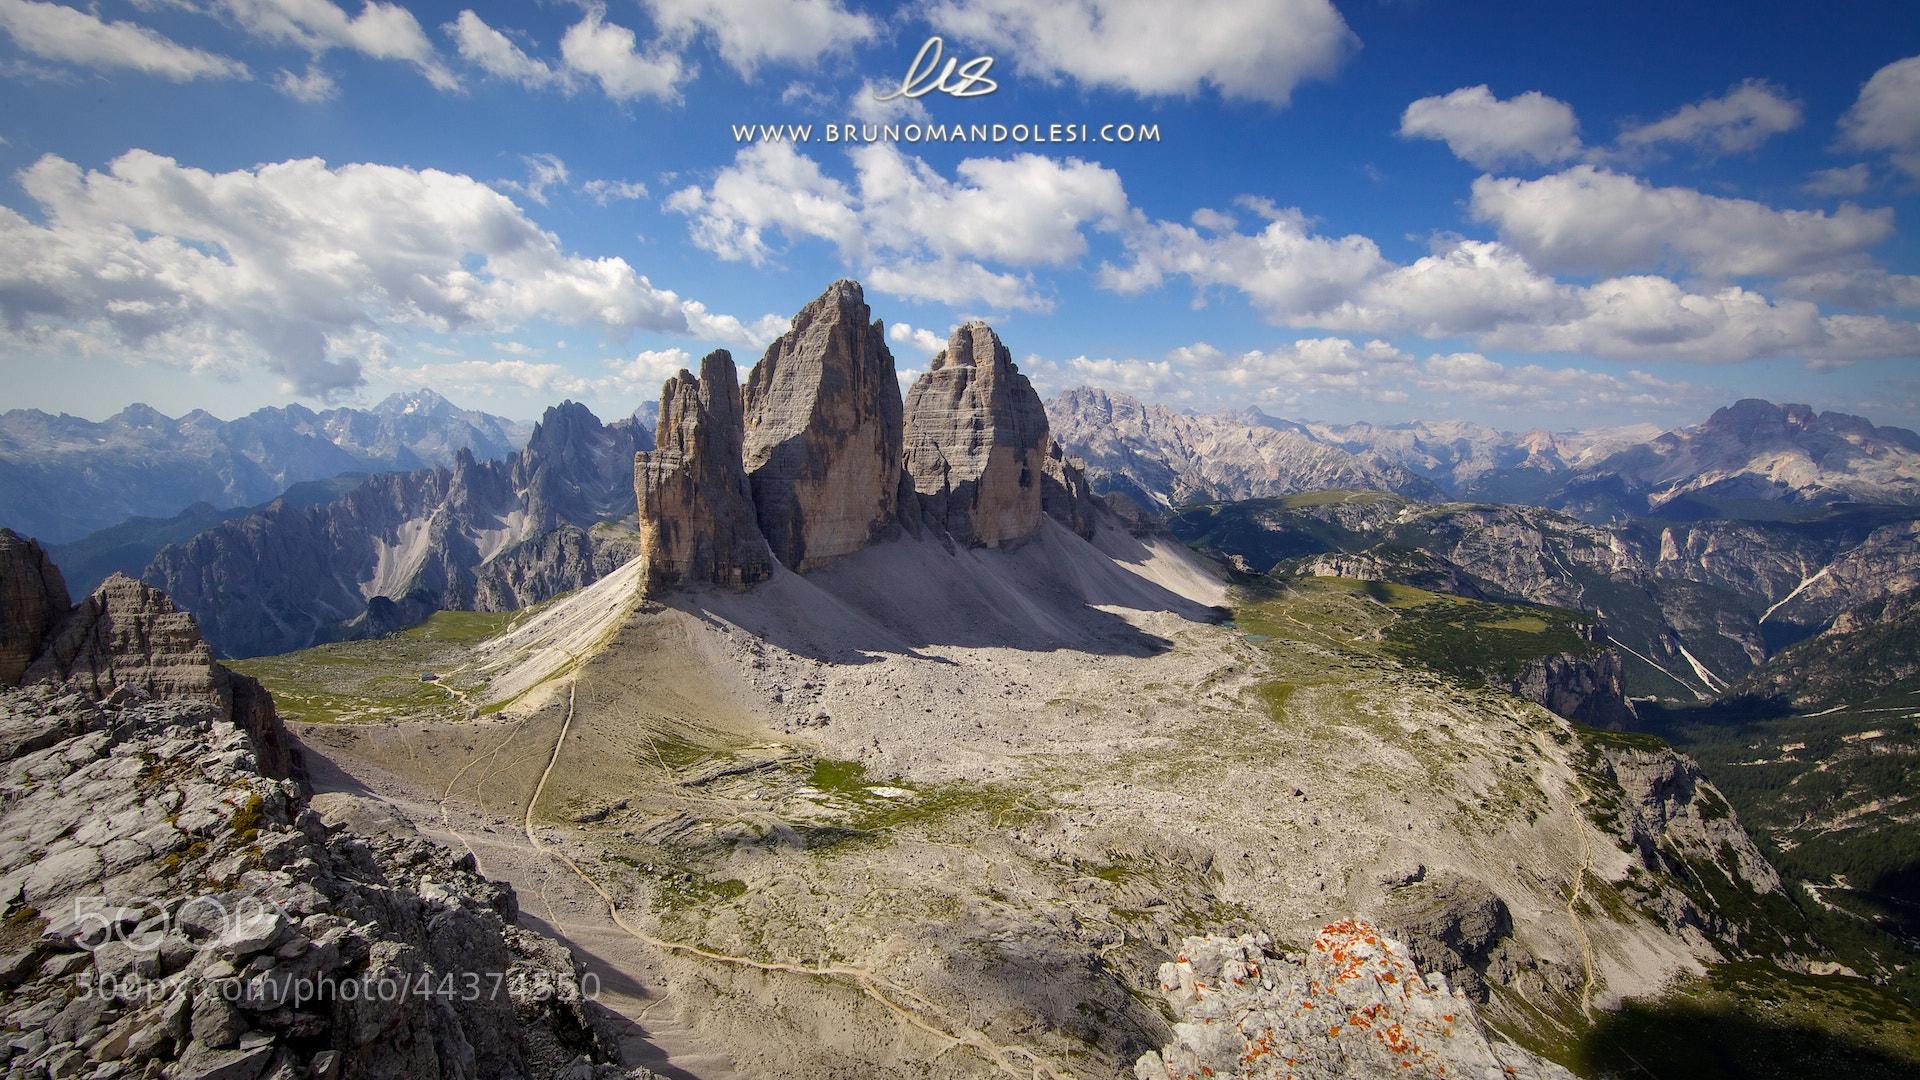 Photograph Tre Cime by bruno mandolesi on 500px